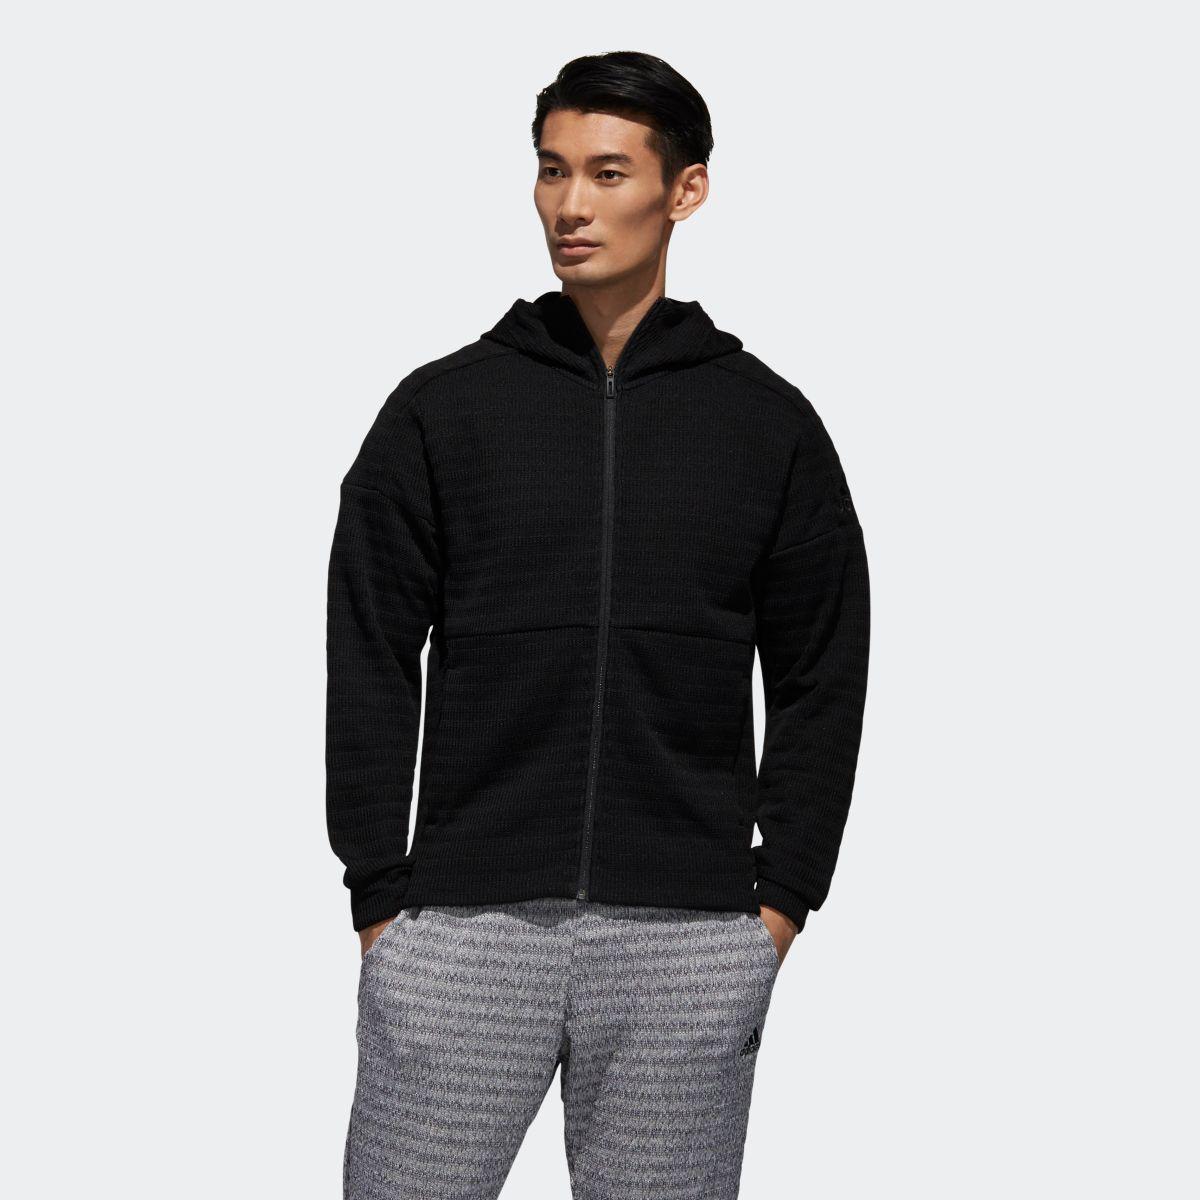 bas prix 6e348 f946e Adidas adidas ID quarter knit full zip parka men ass Rheticusware tops  parka, sweat shirt DV1118